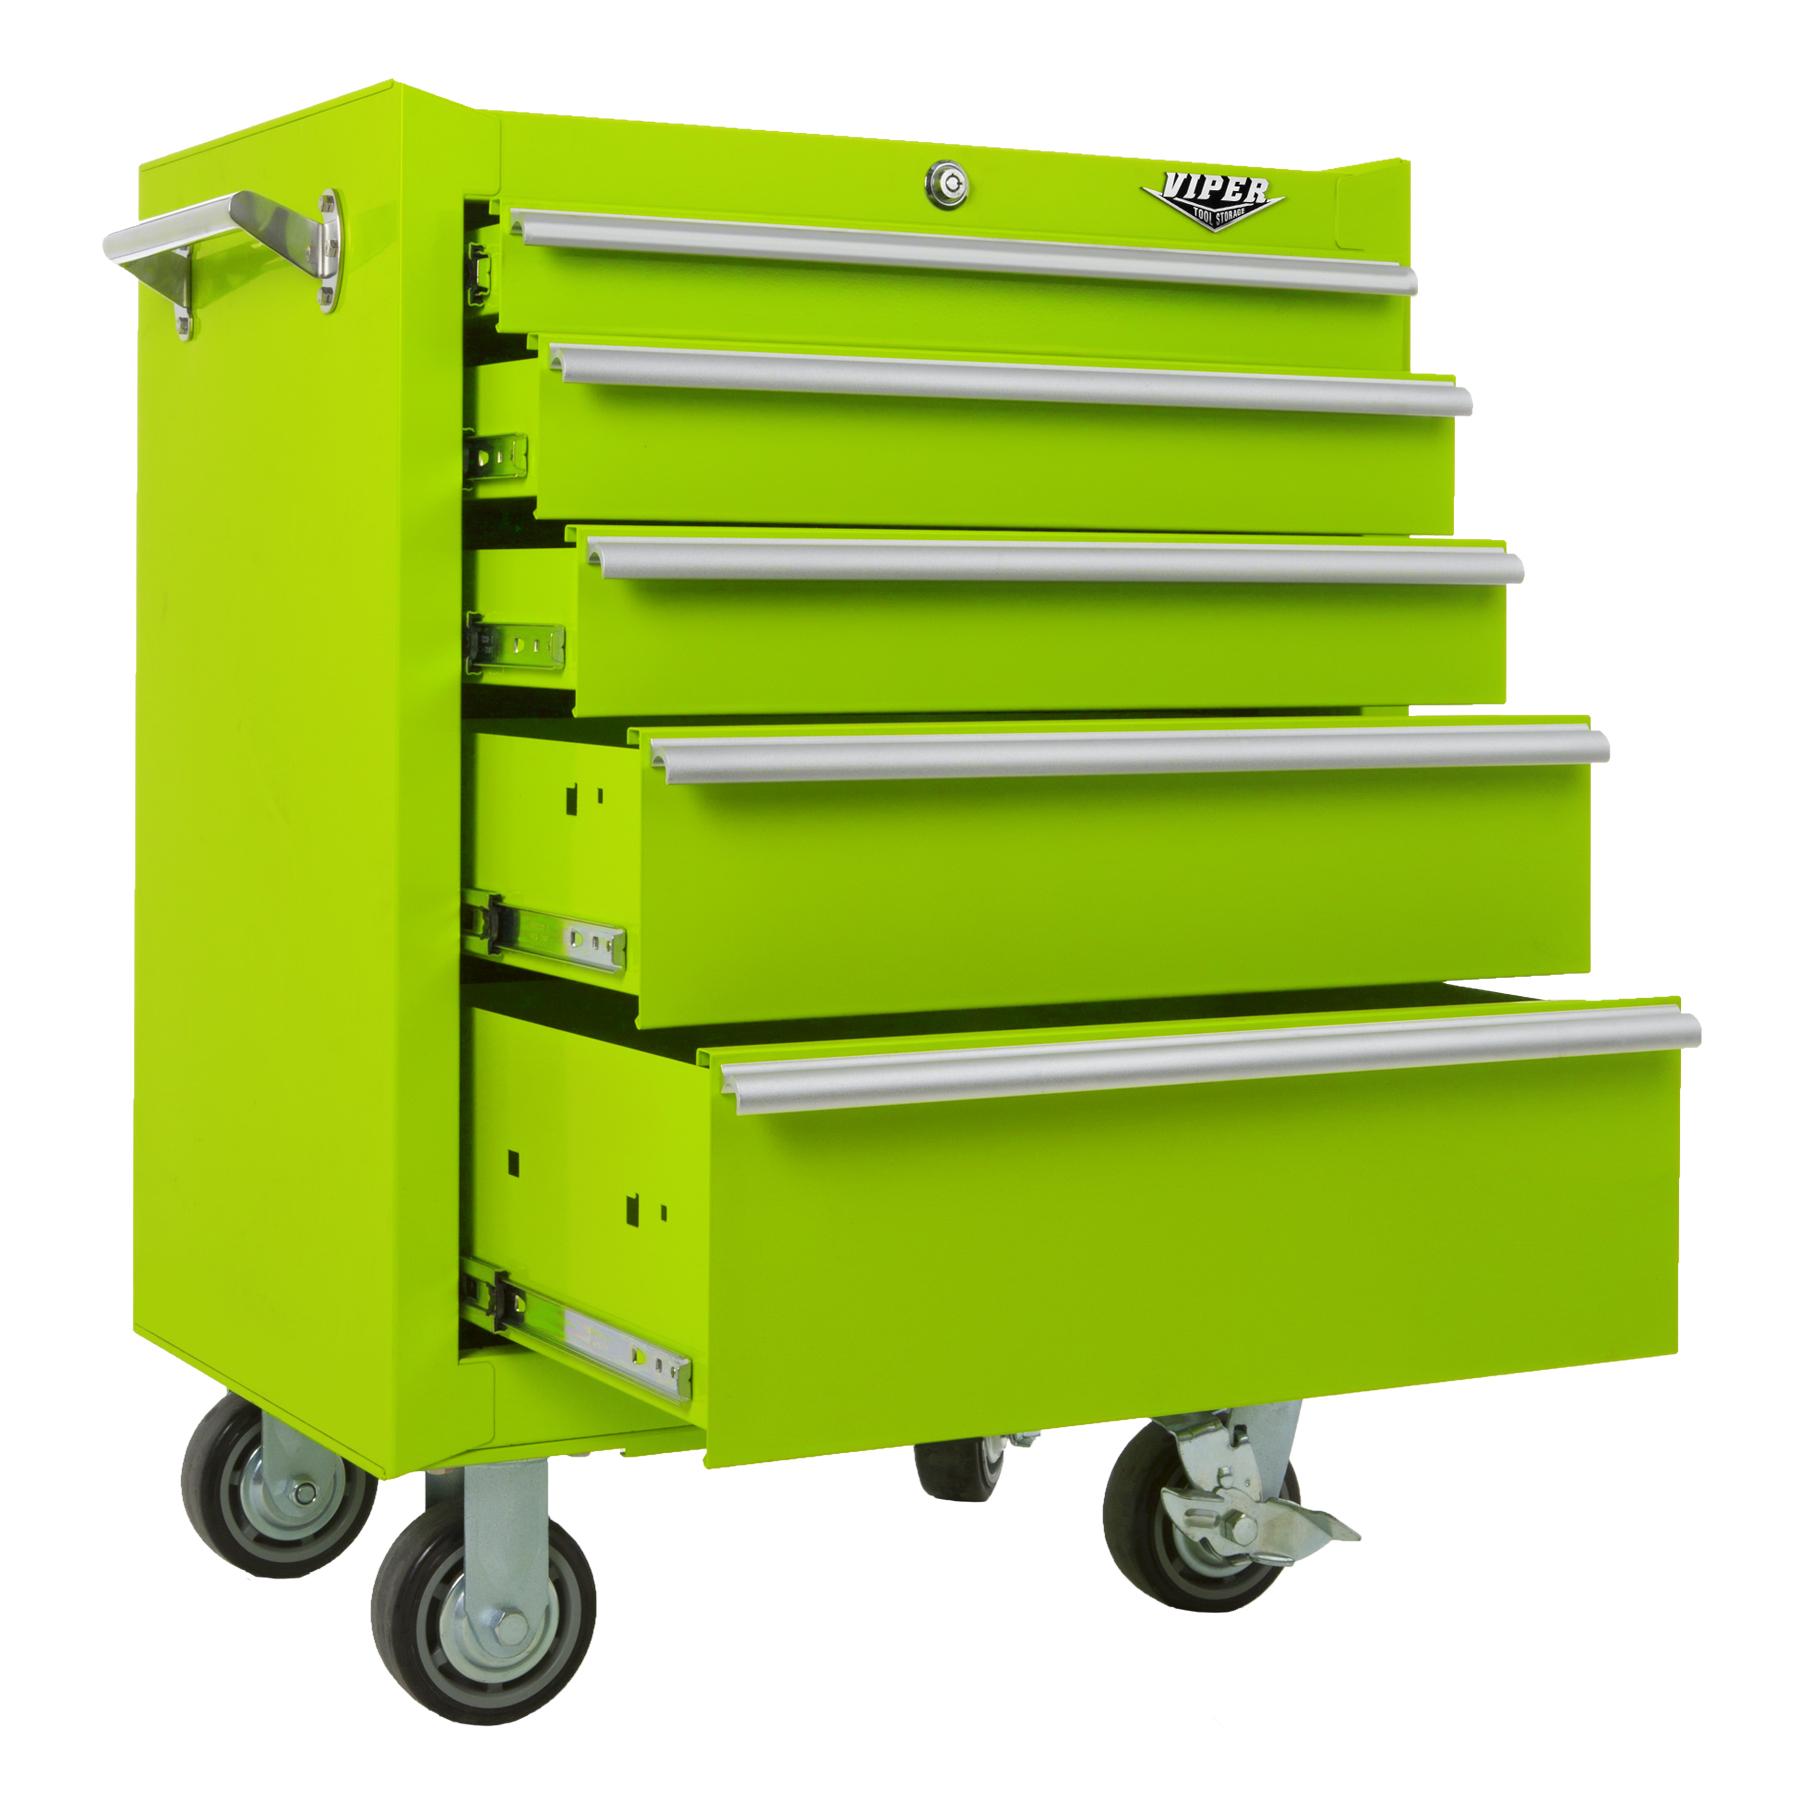 Viper Tool Storage 26 Inch 5 Drawer 18G Steel Roller